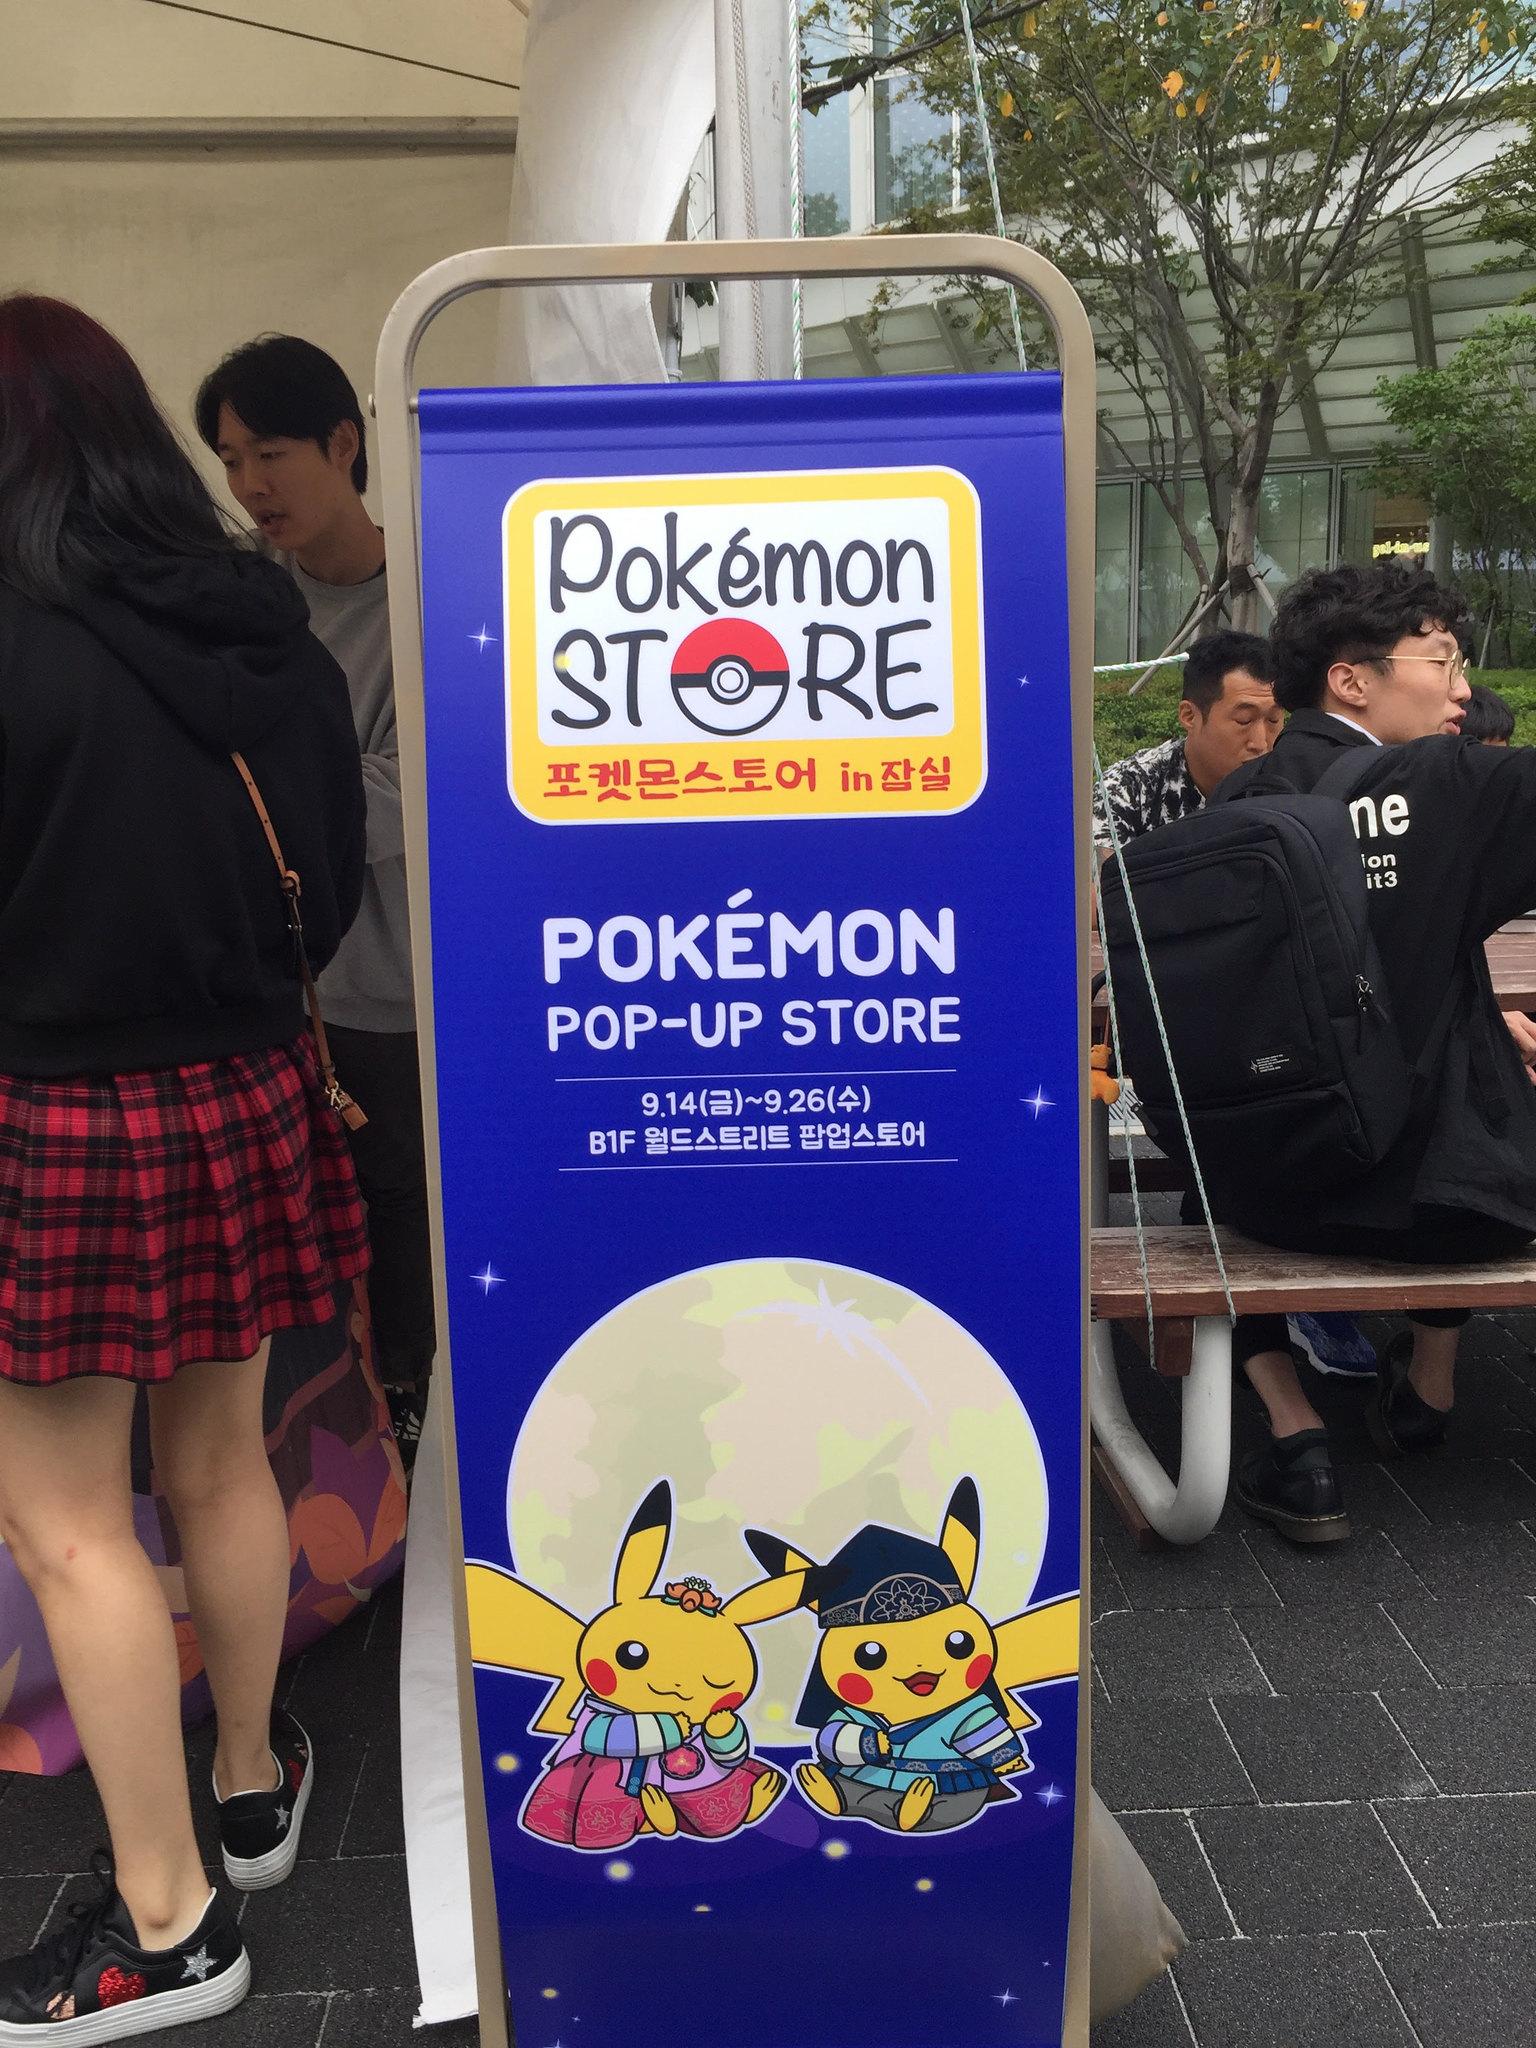 keb_hana_bank_and_sk_telecom_pokemon_go_week_at_pokemon_fest_2018_pokemon_pop_up_store